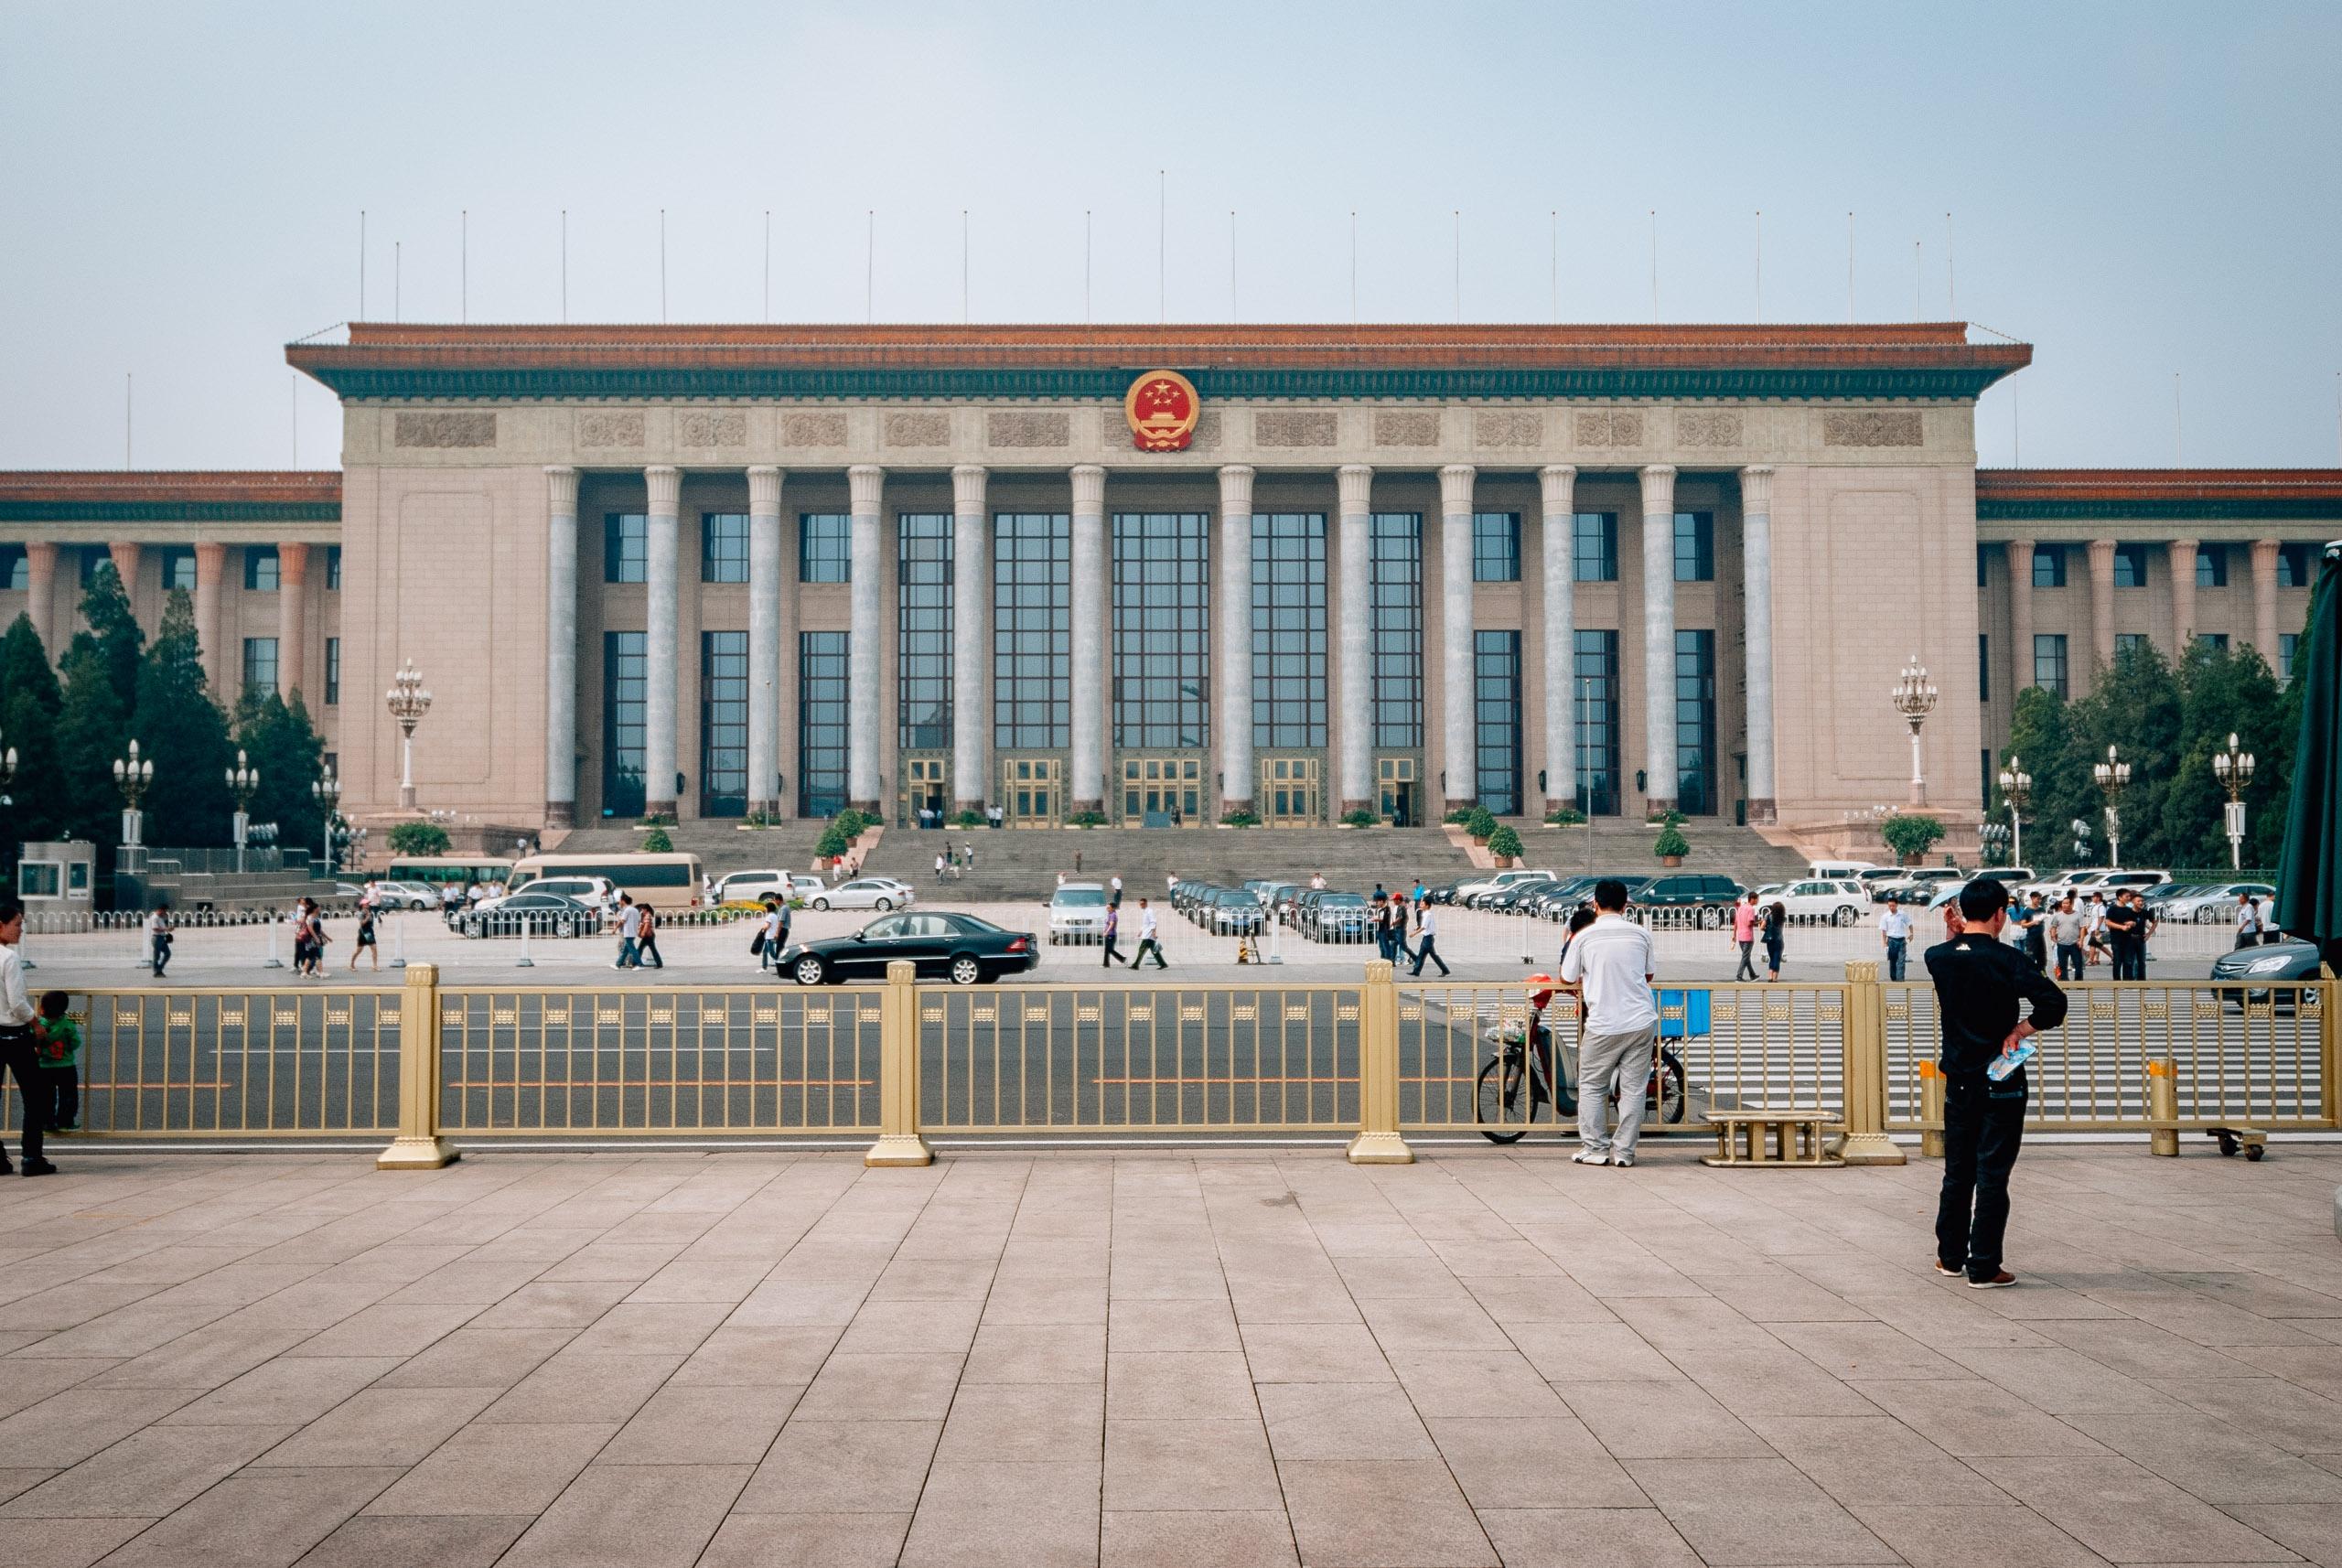 China - Beijing & The Great Wall - 2010-0903-DSC_0286_47783